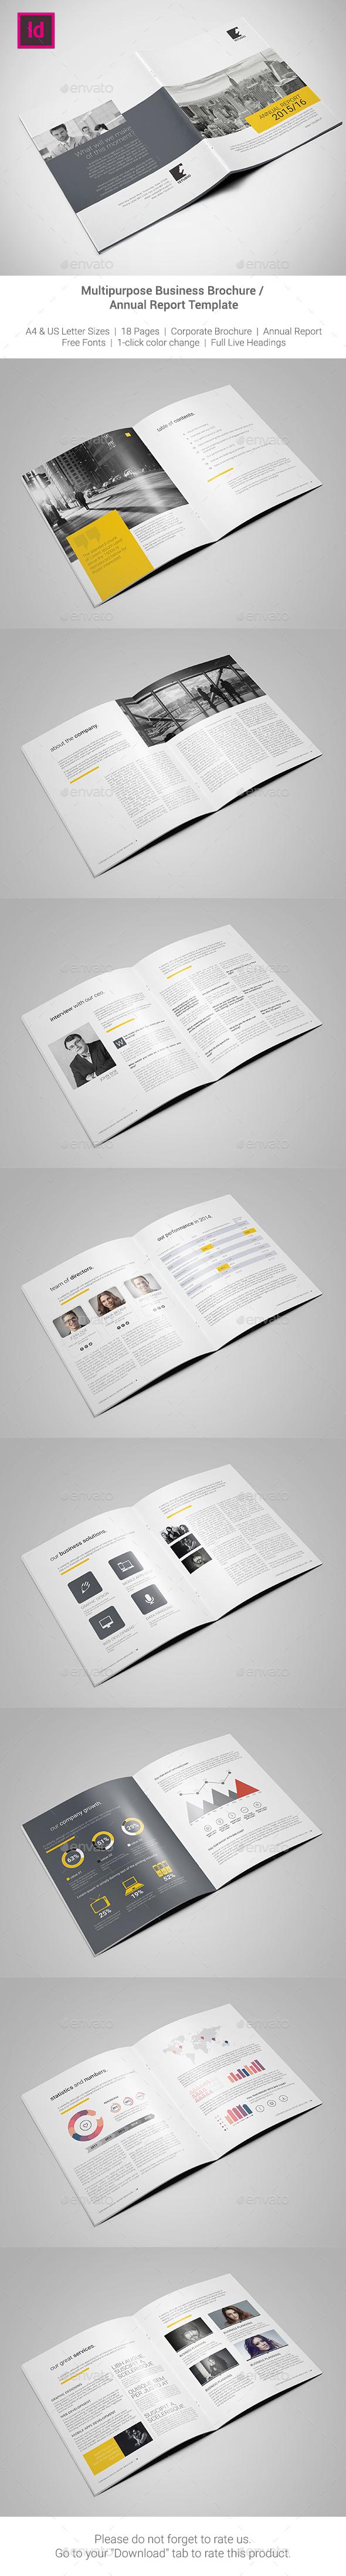 Corporate Brochure / Annual Report Template  - Corporate Brochures